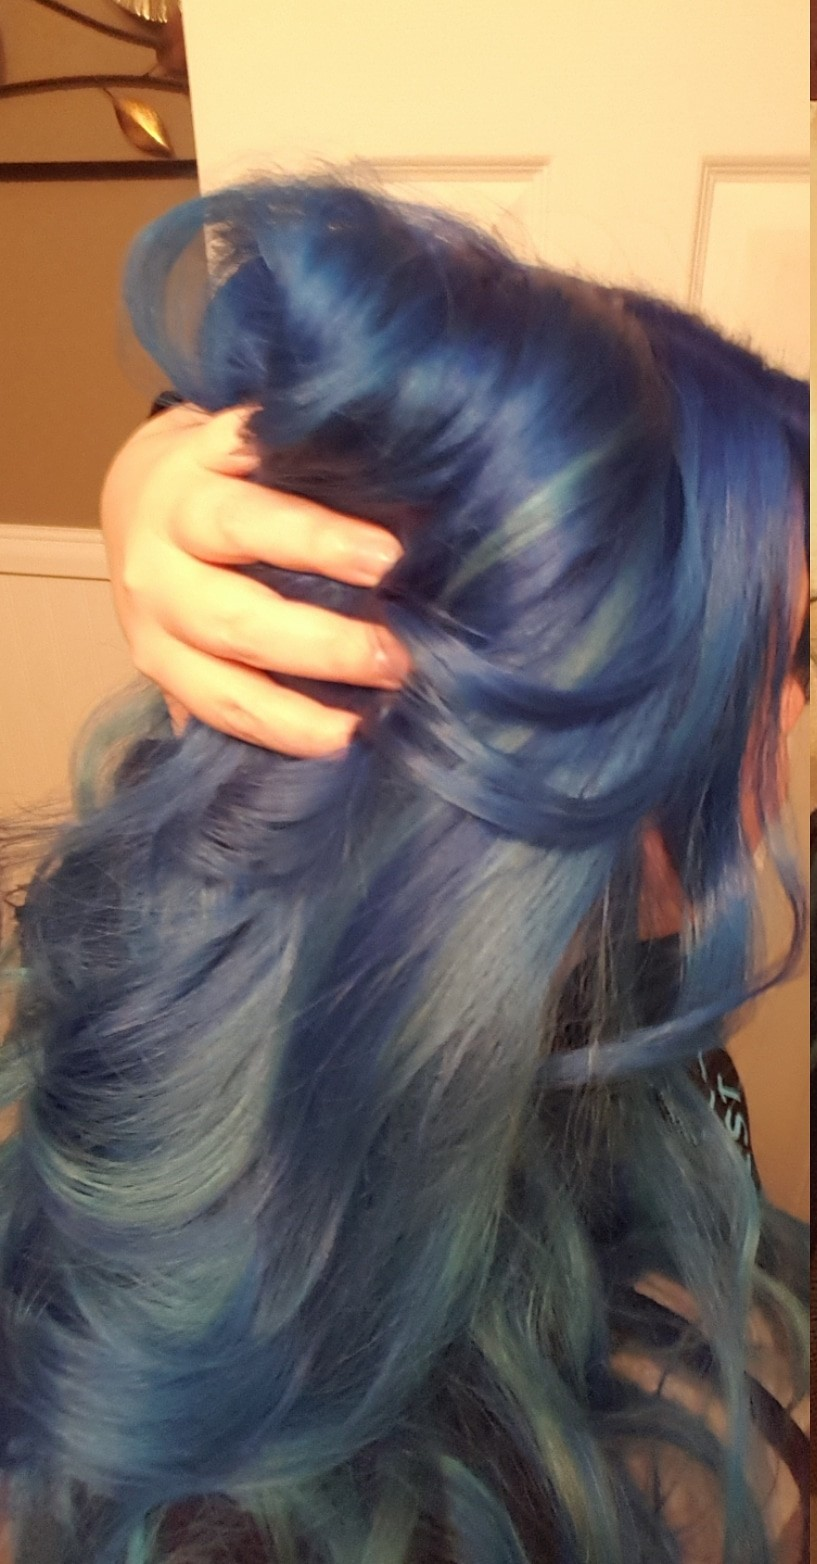 J. Maries Hair Salon - hair care  | Photo 1 of 2 | Address: 30436 Euclid Ave, Wickliffe, OH 44092, USA | Phone: (440) 943-2662